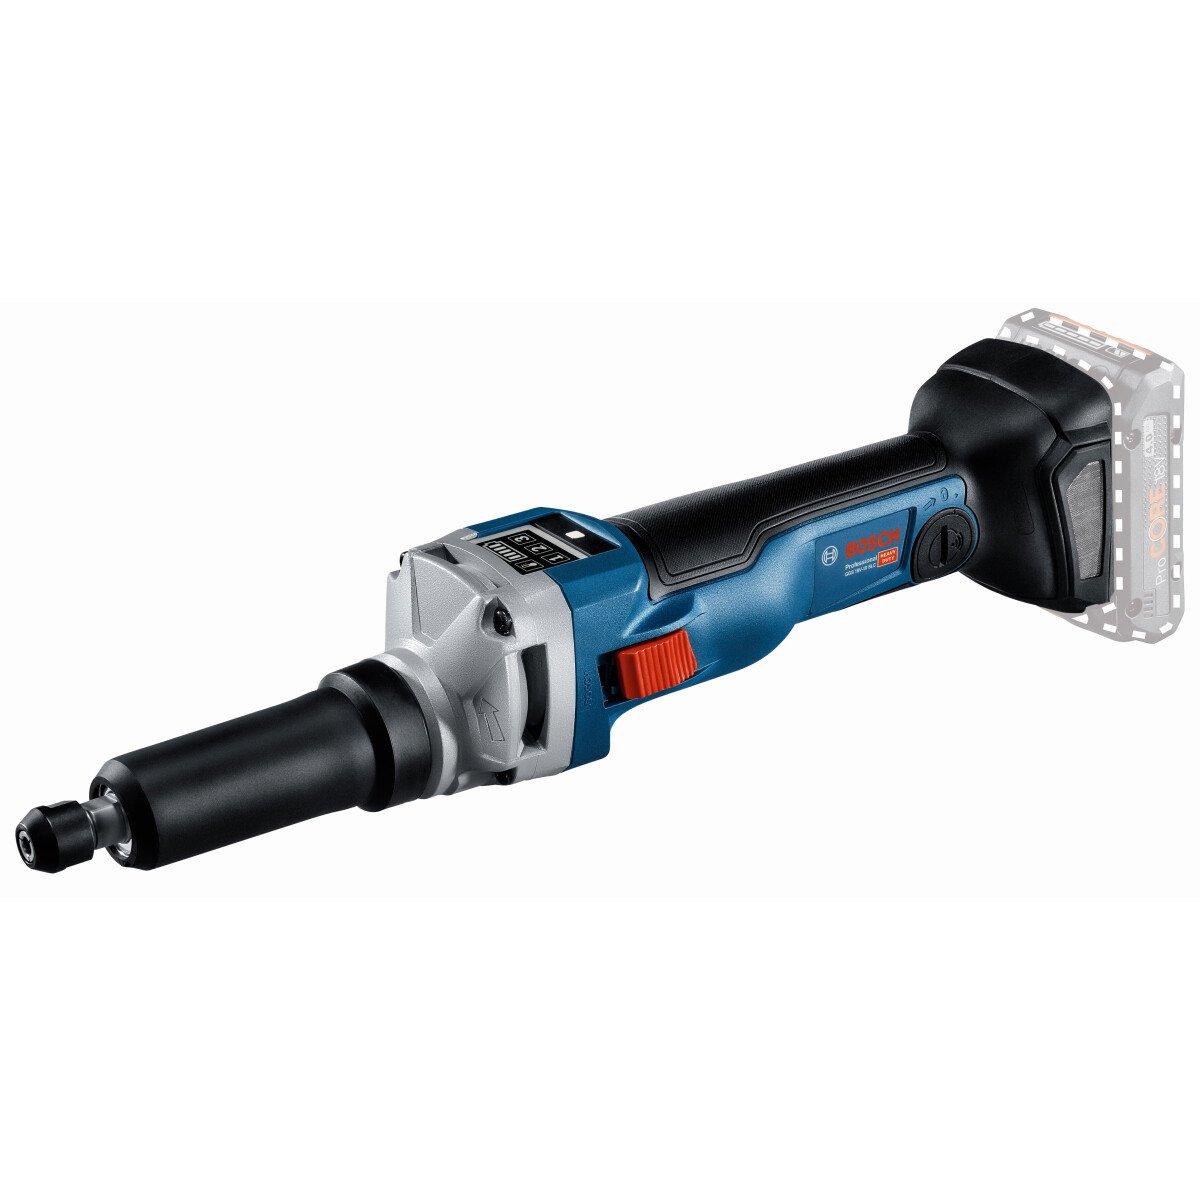 Bosch GGS 18 V-10 SLC 18v Body Only BRUSHLESS Straight Grinder in L-Boxx